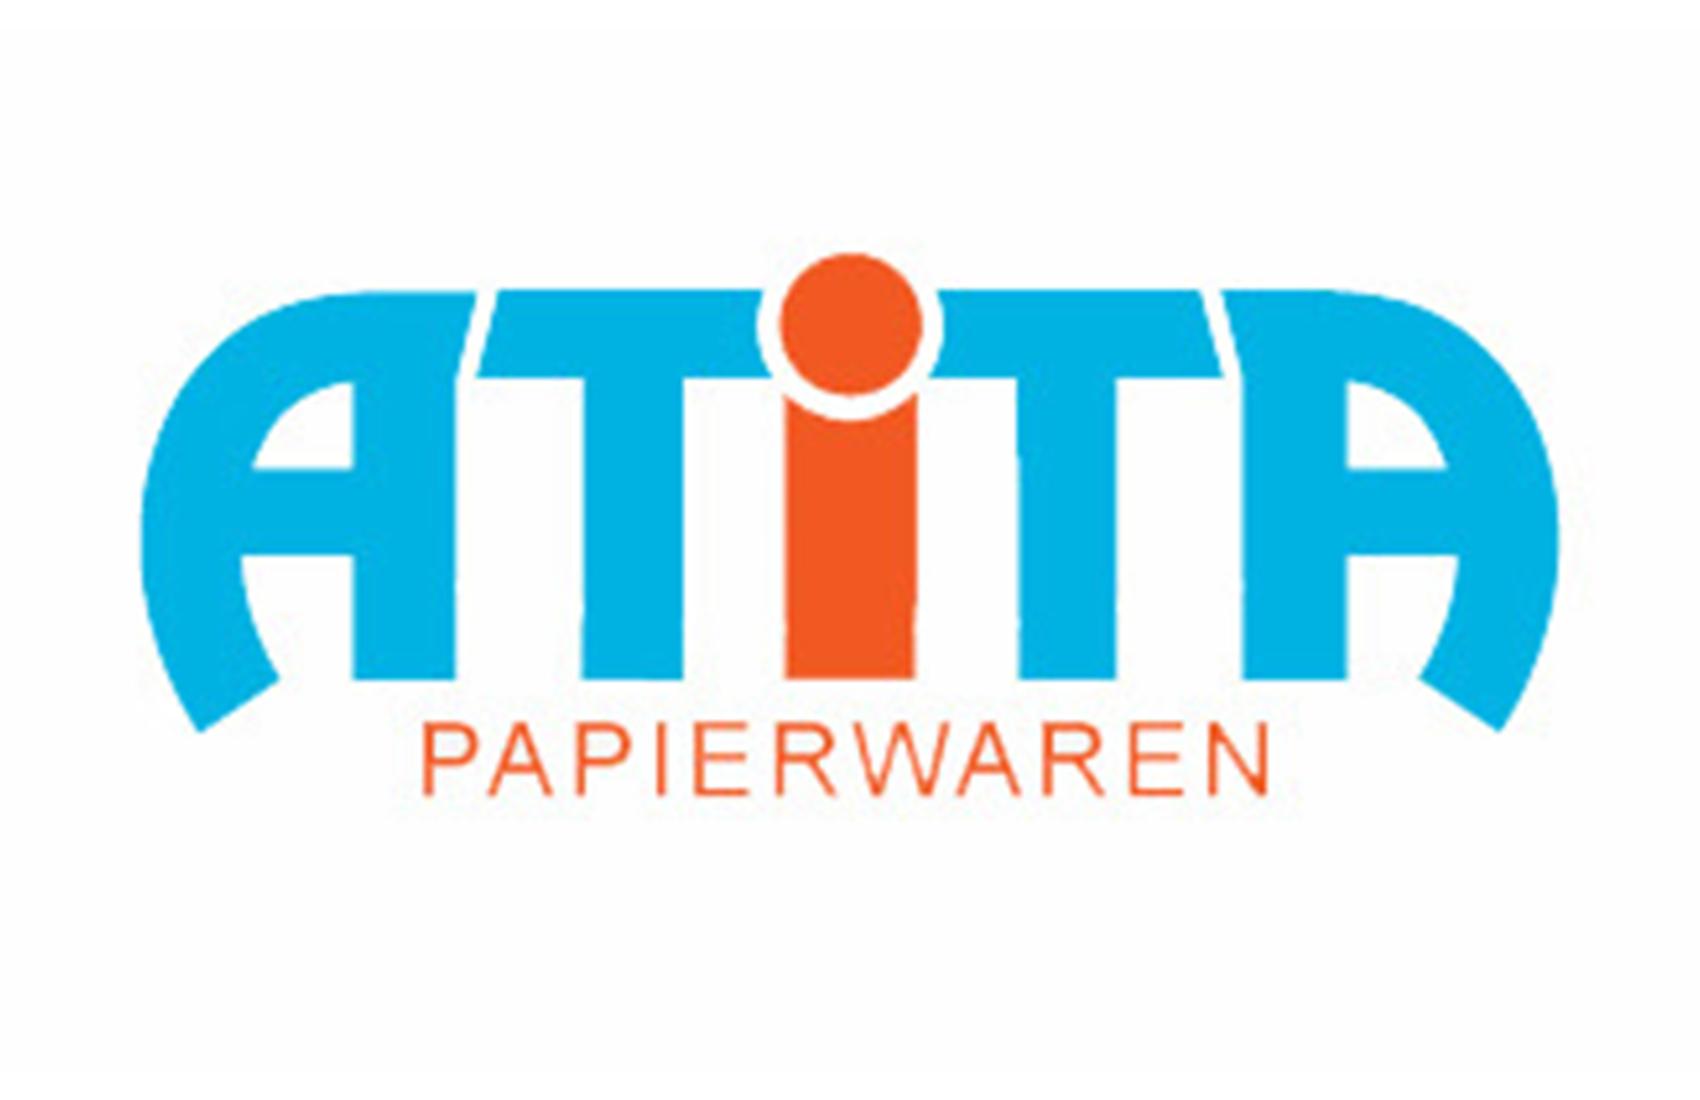 Atita Papierwaren - Driespoort Shopping